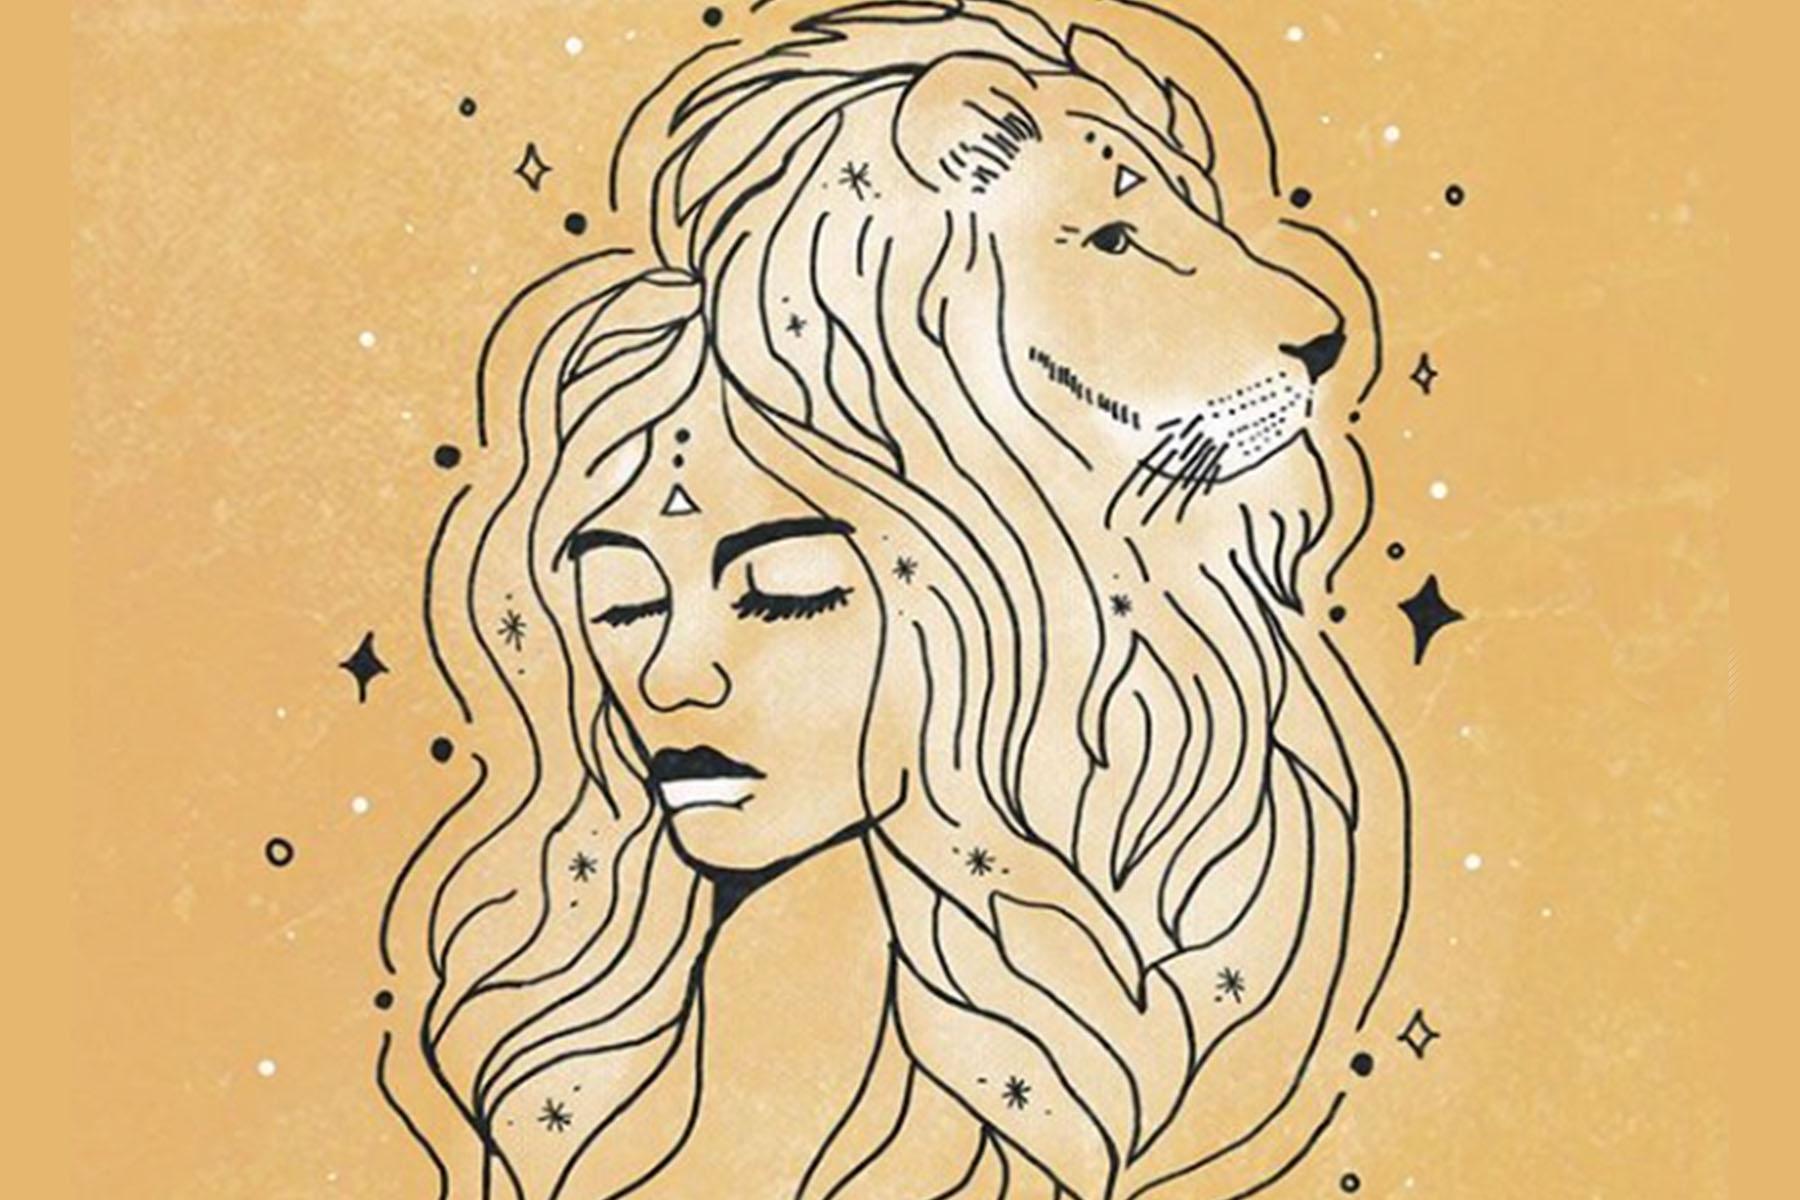 Your Leo Season Horoscope: Embracing Bold Beauty